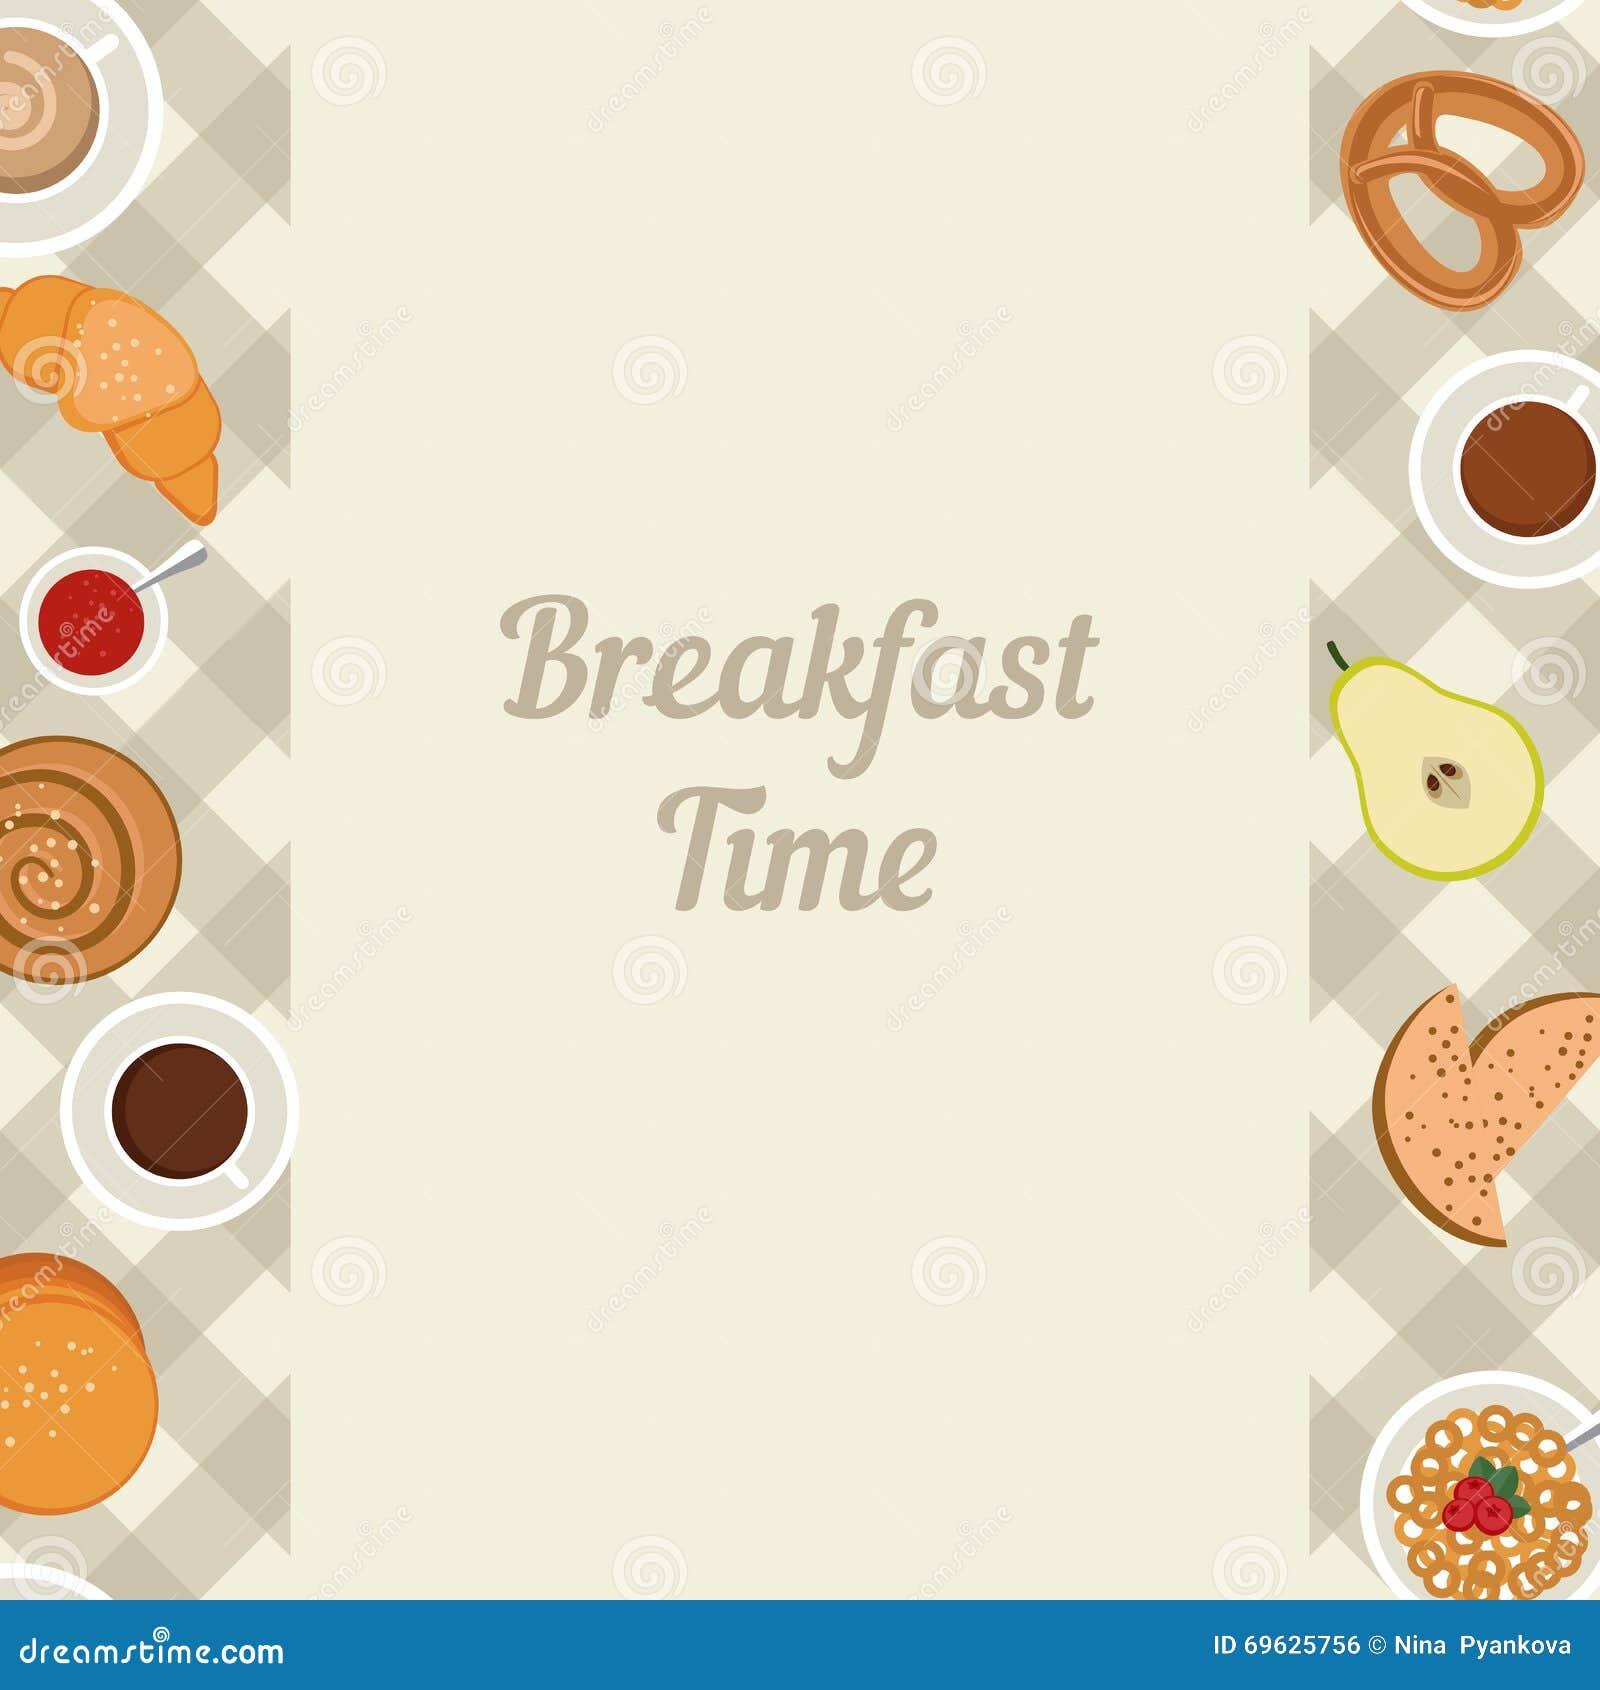 breakfast time illustration stock vector - illustration of bread